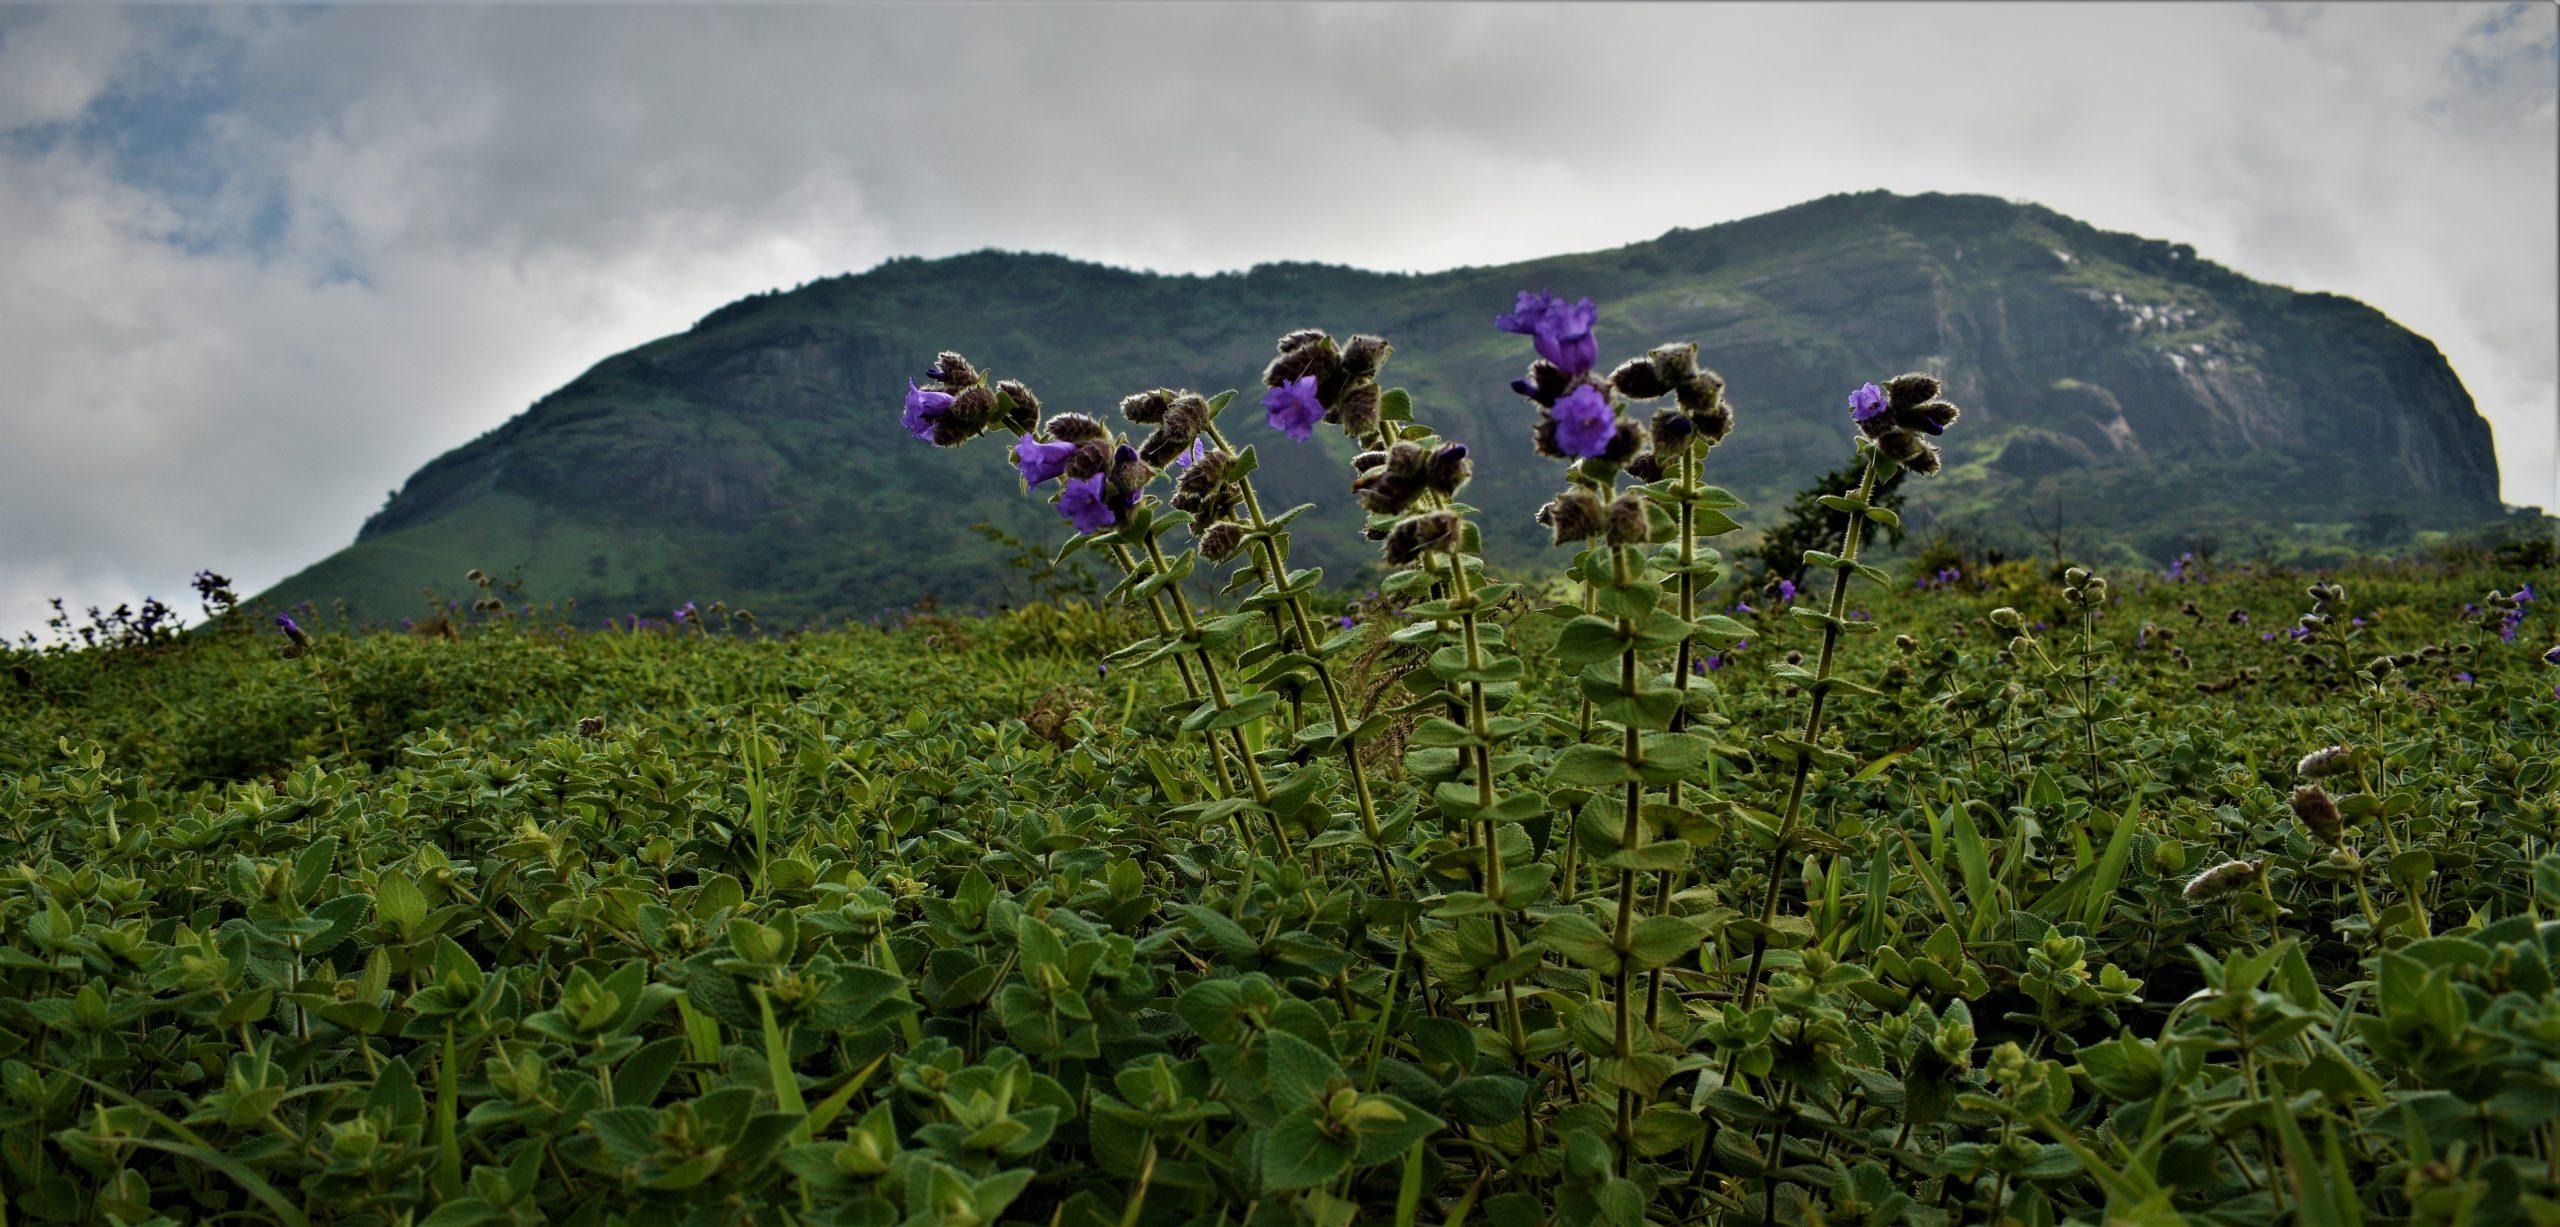 Pulmonoria Plant